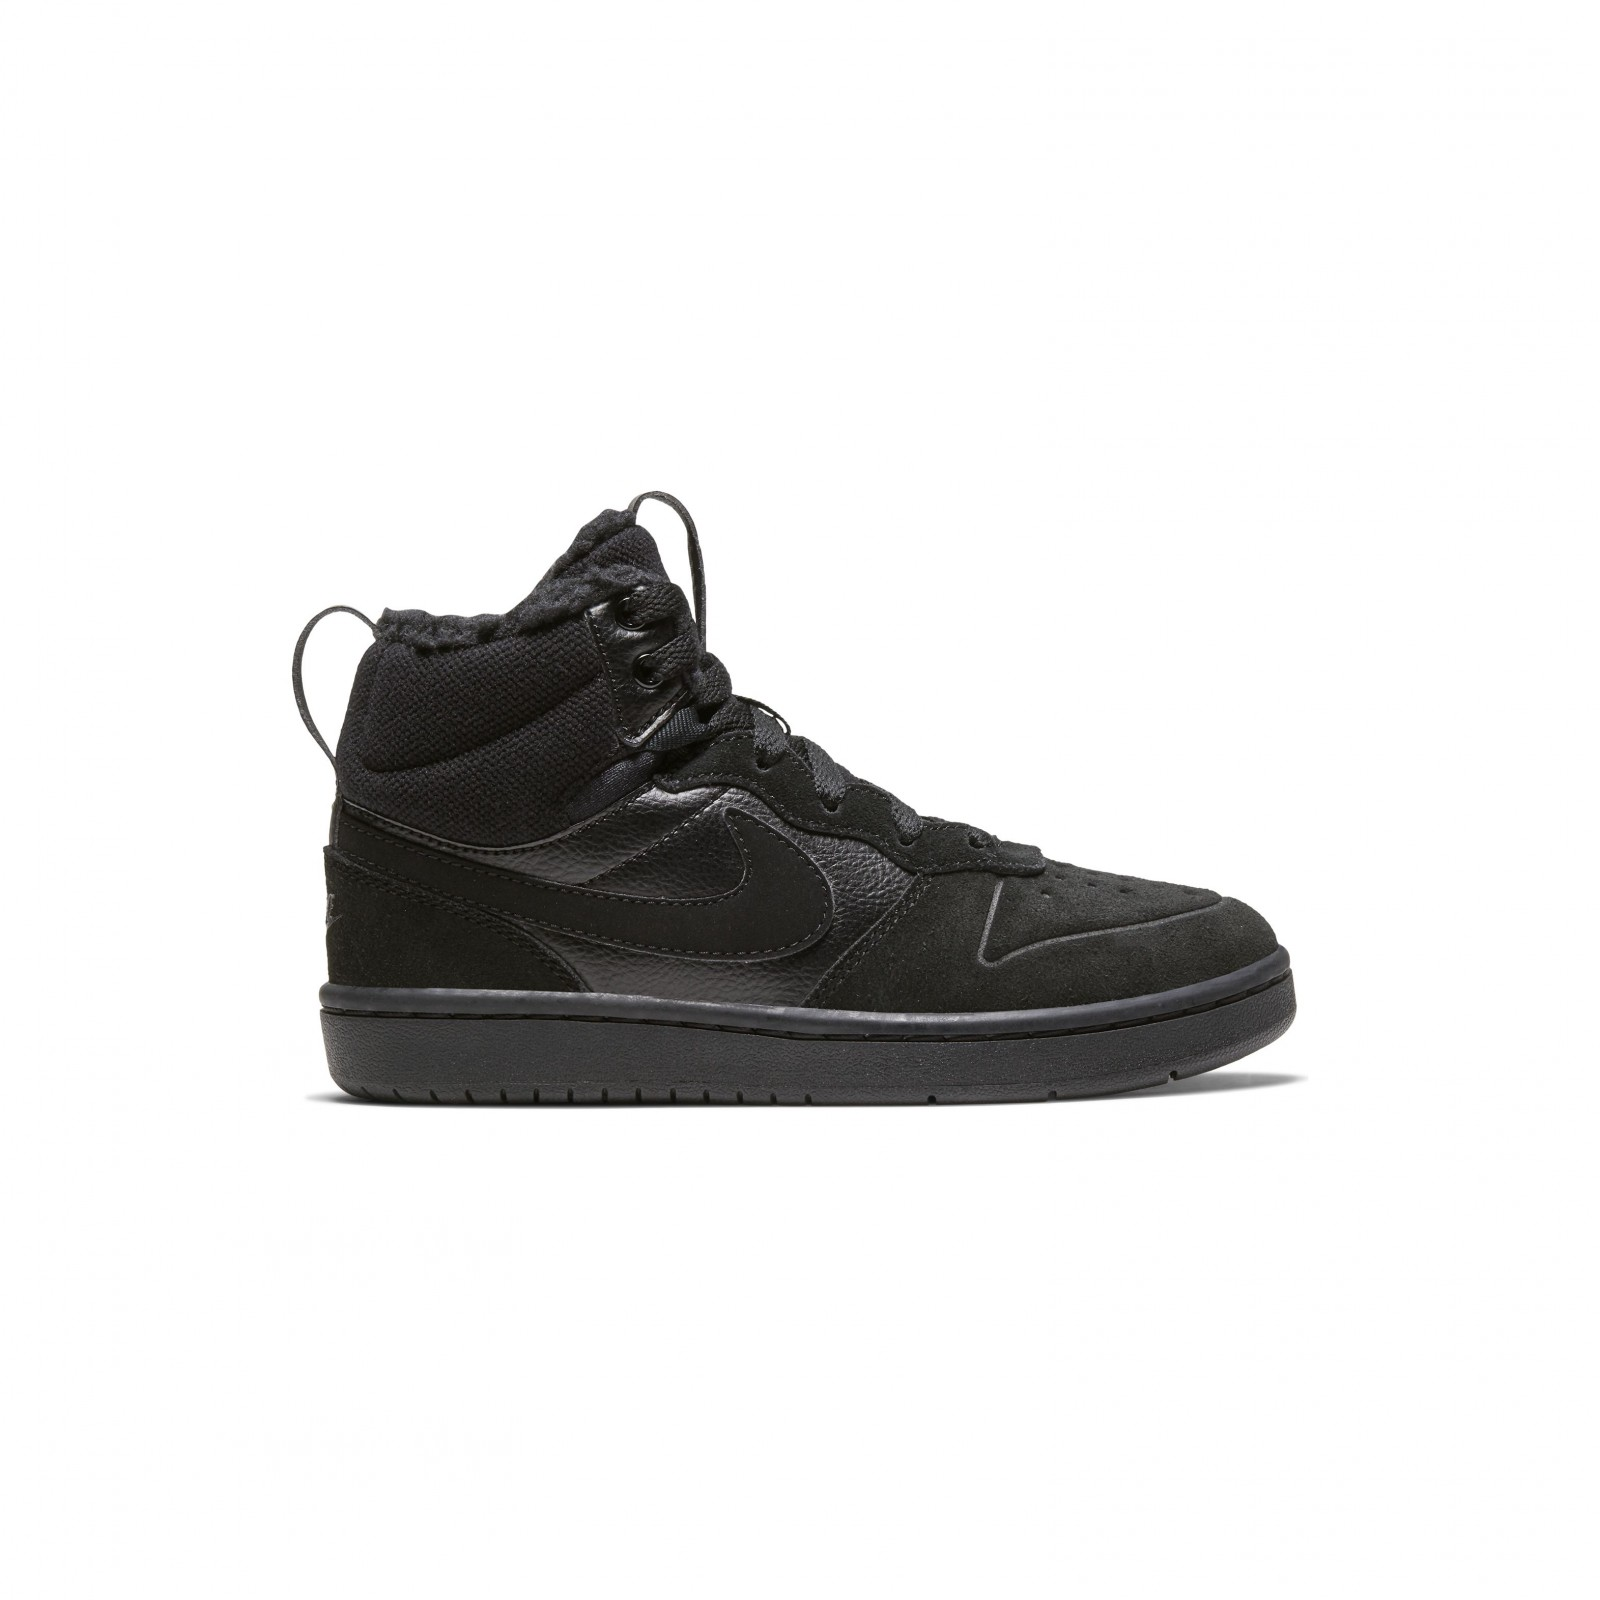 Court borough mid 2 boot ps BLACK/BLACK-BLACK